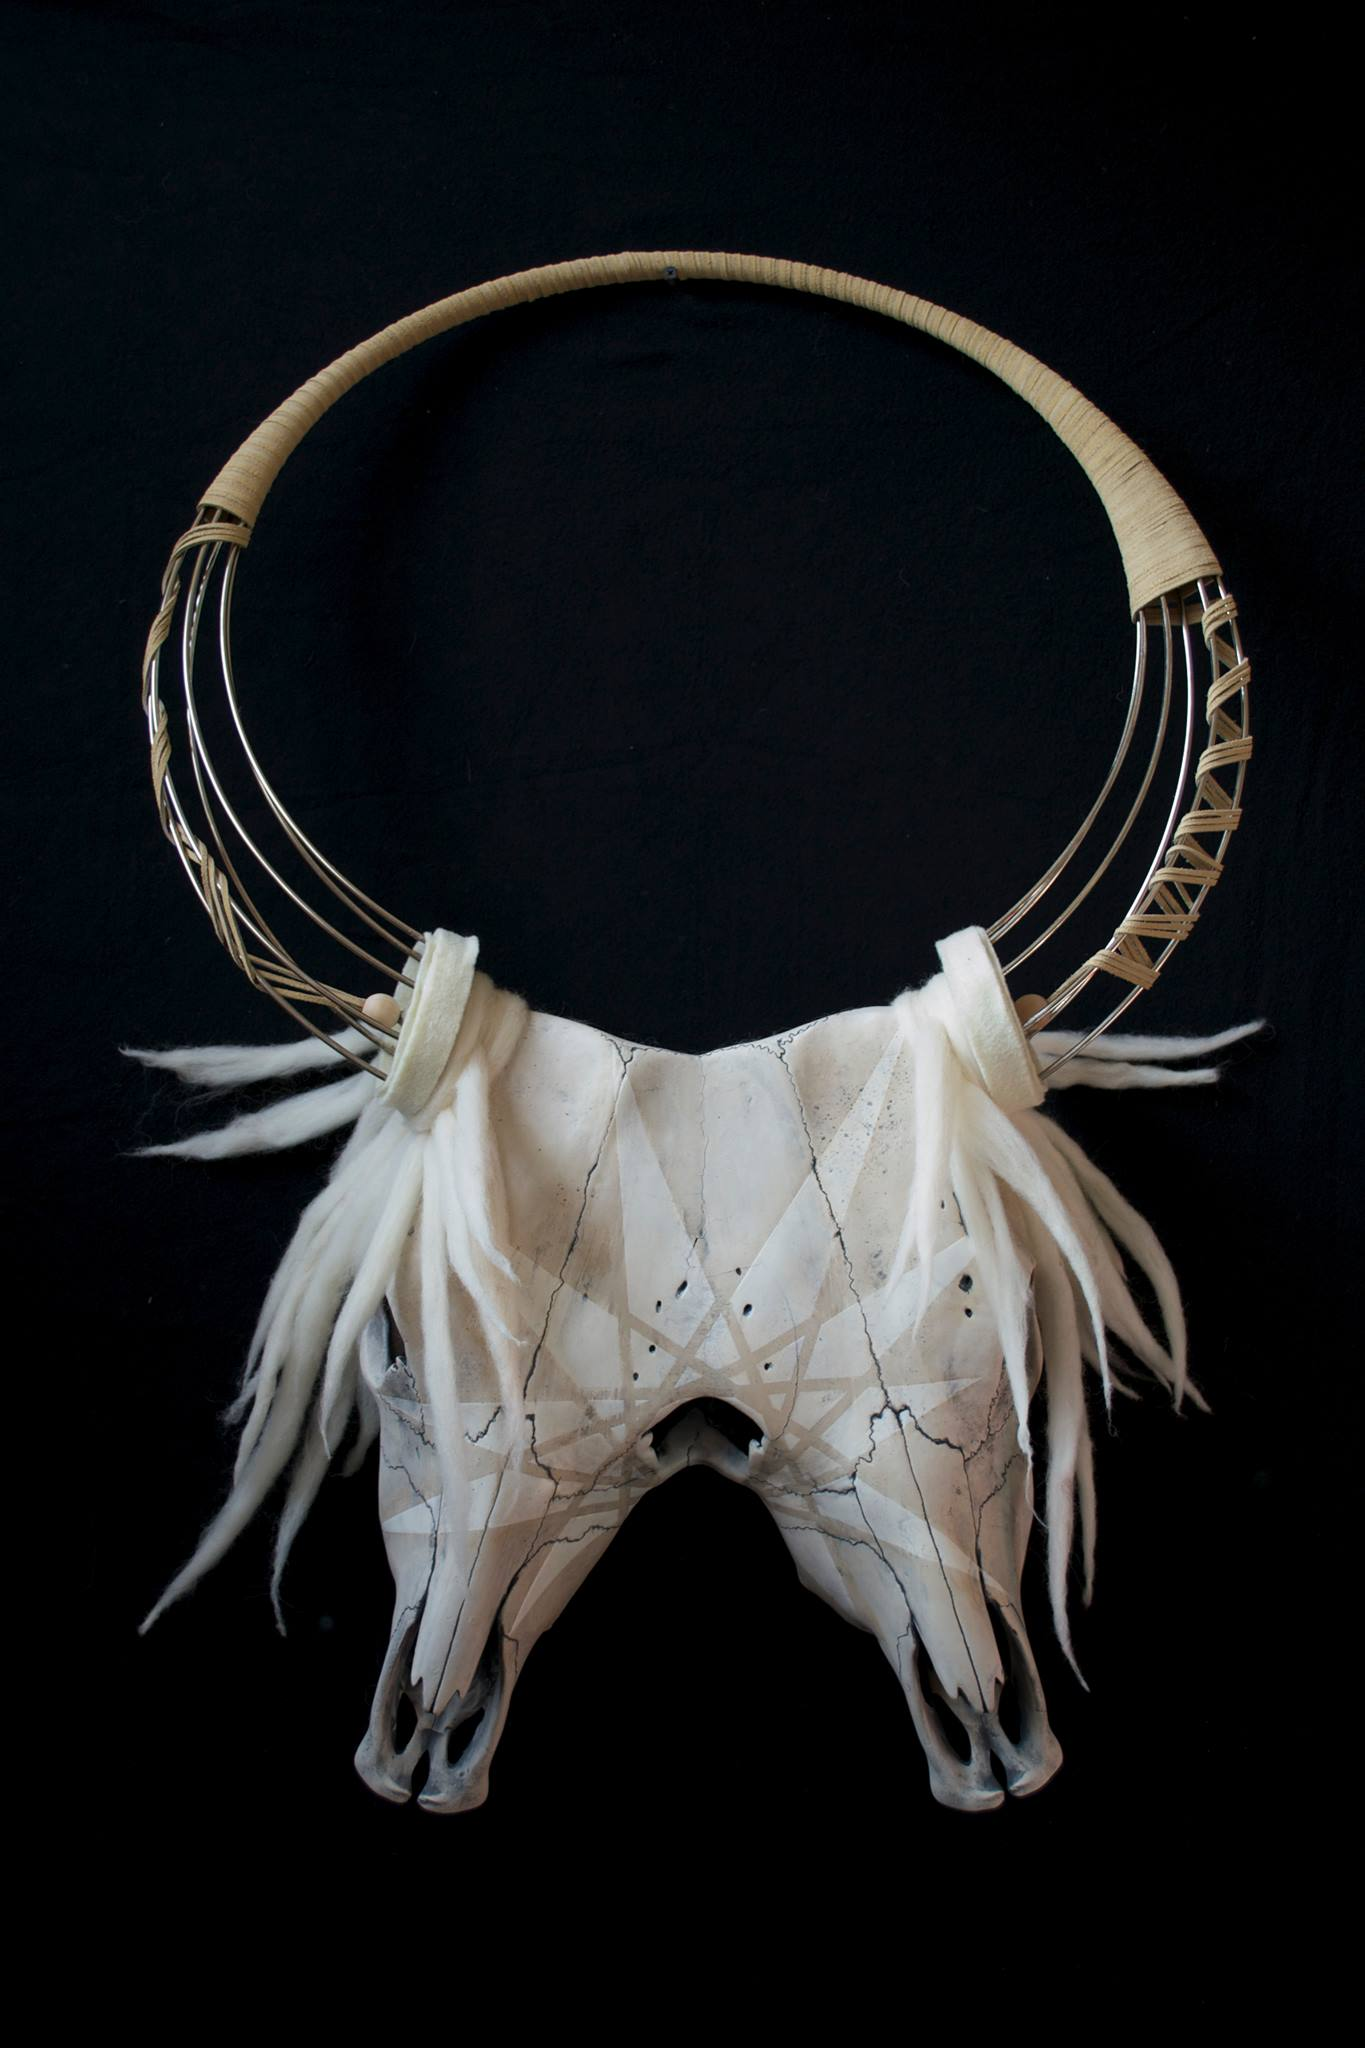 'The Unicorn',Ceramic, Steel, Wool. Cannupa Hanska